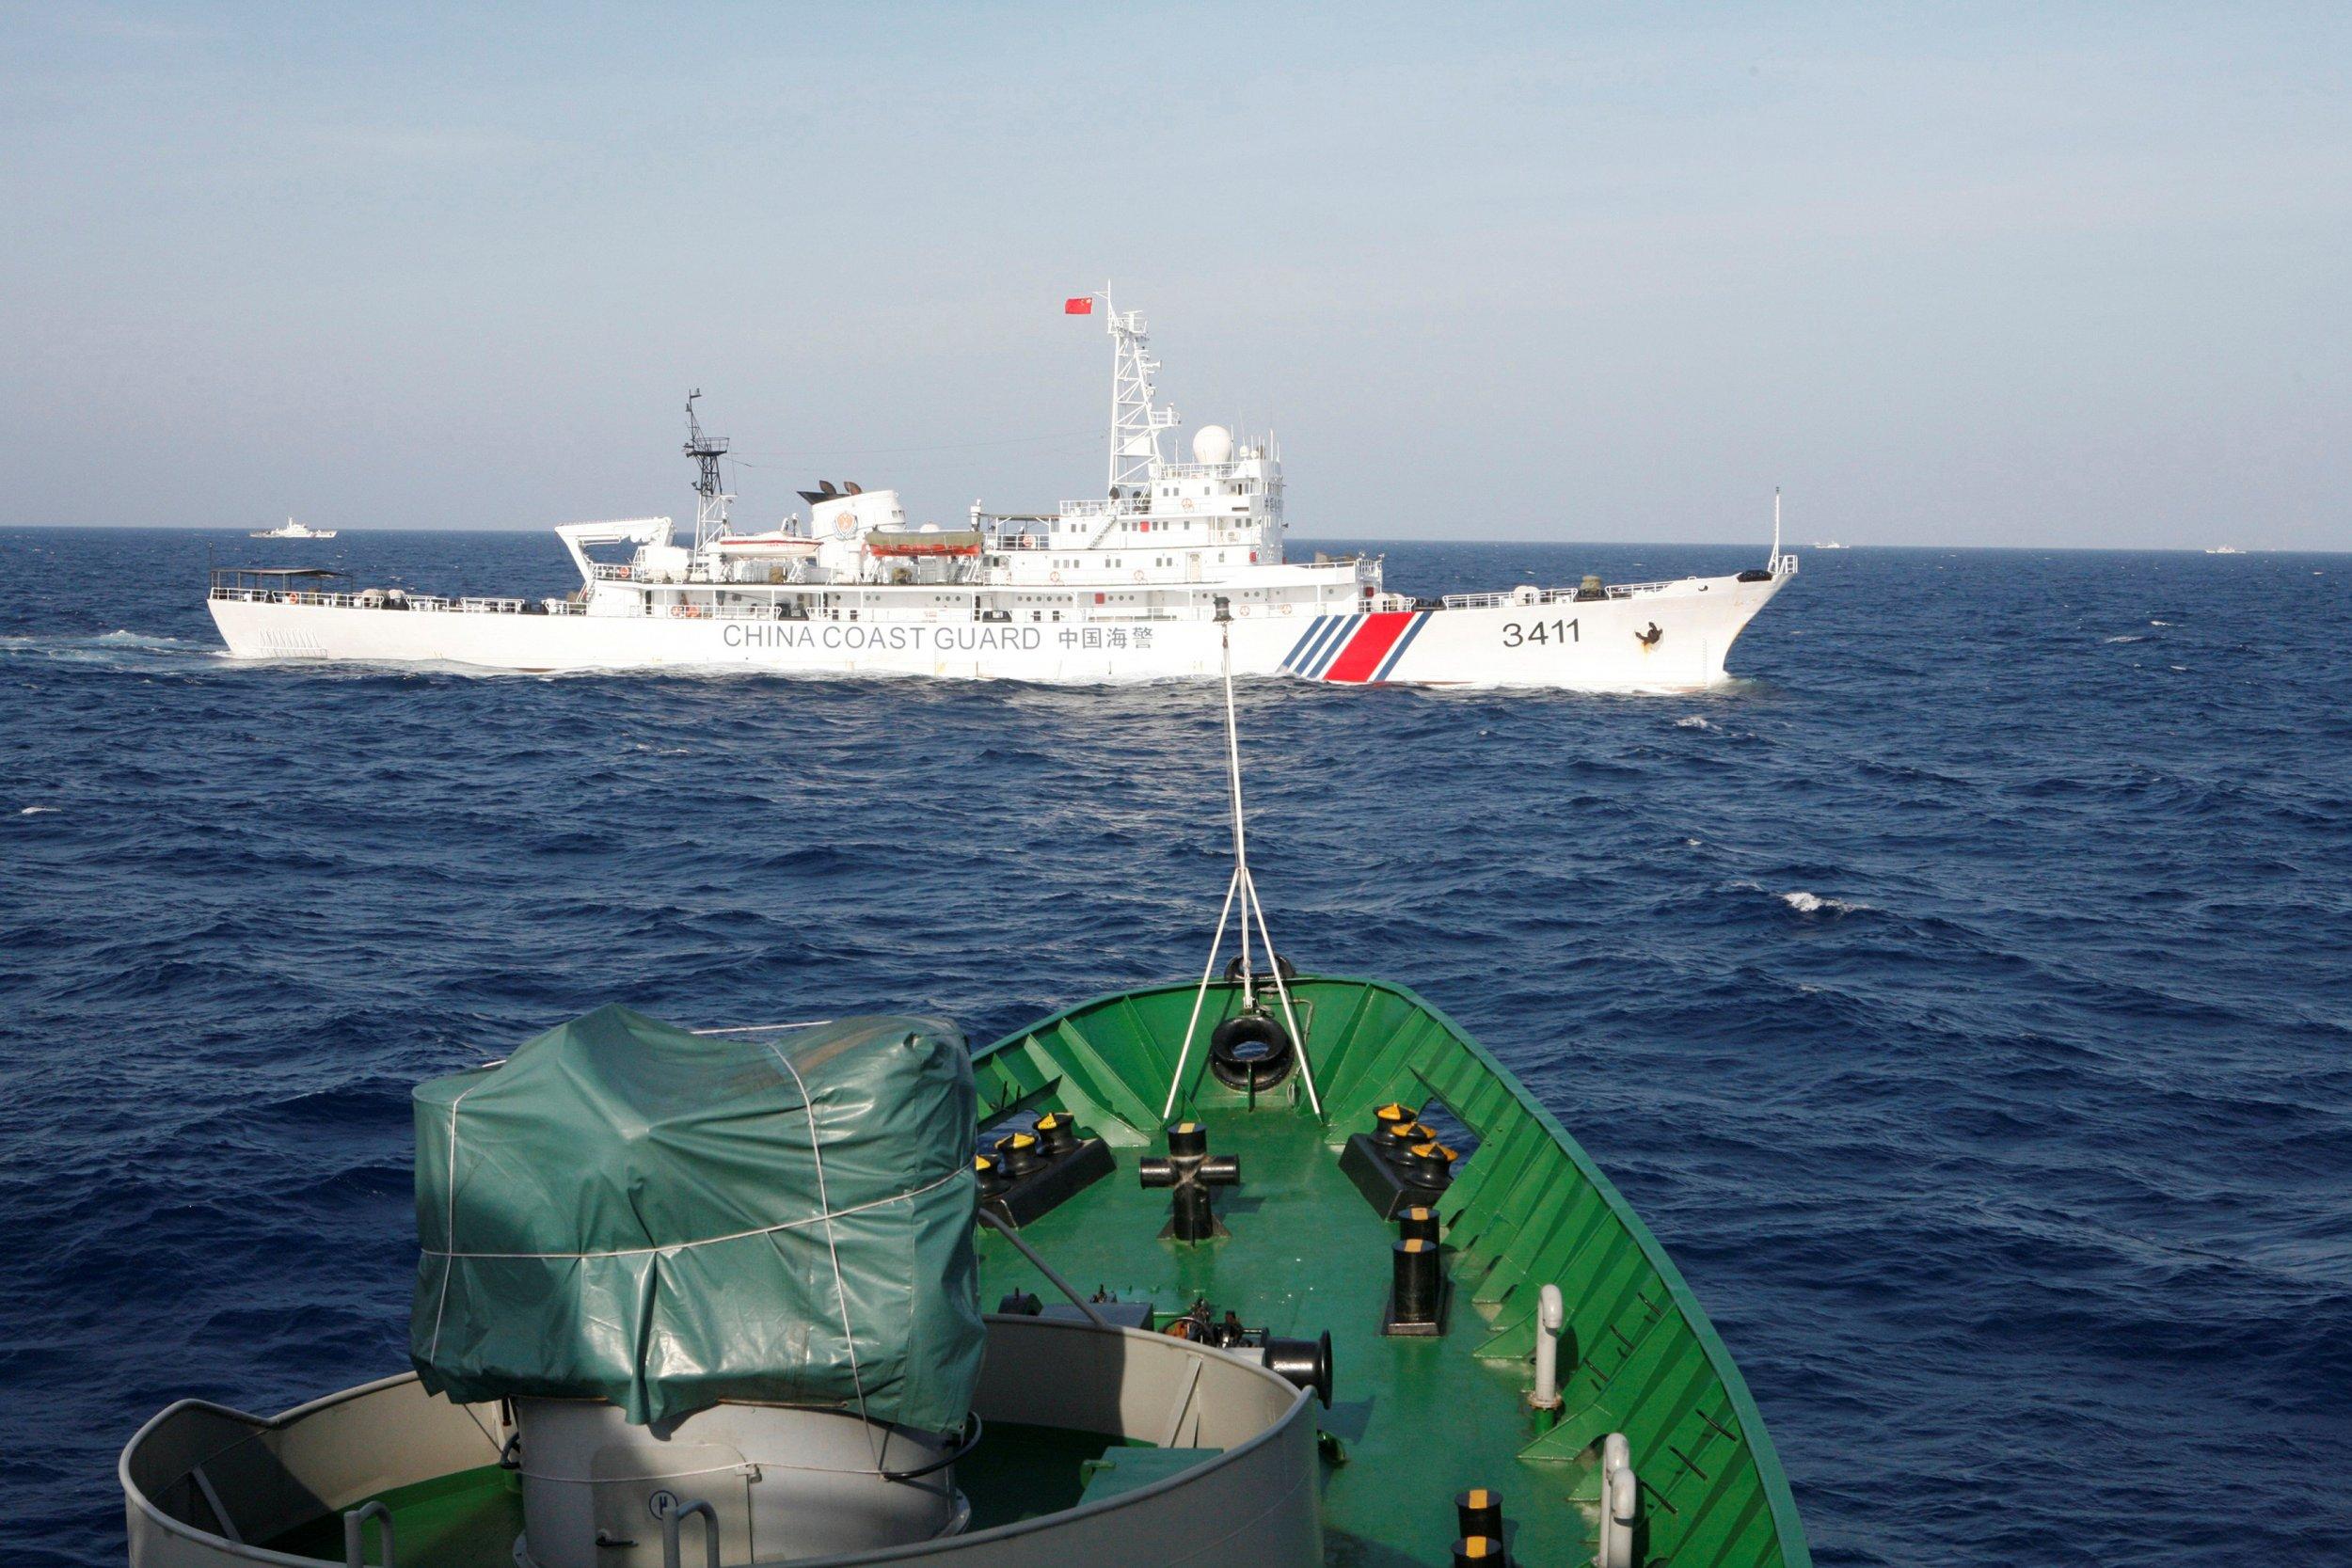 South China Sea boats